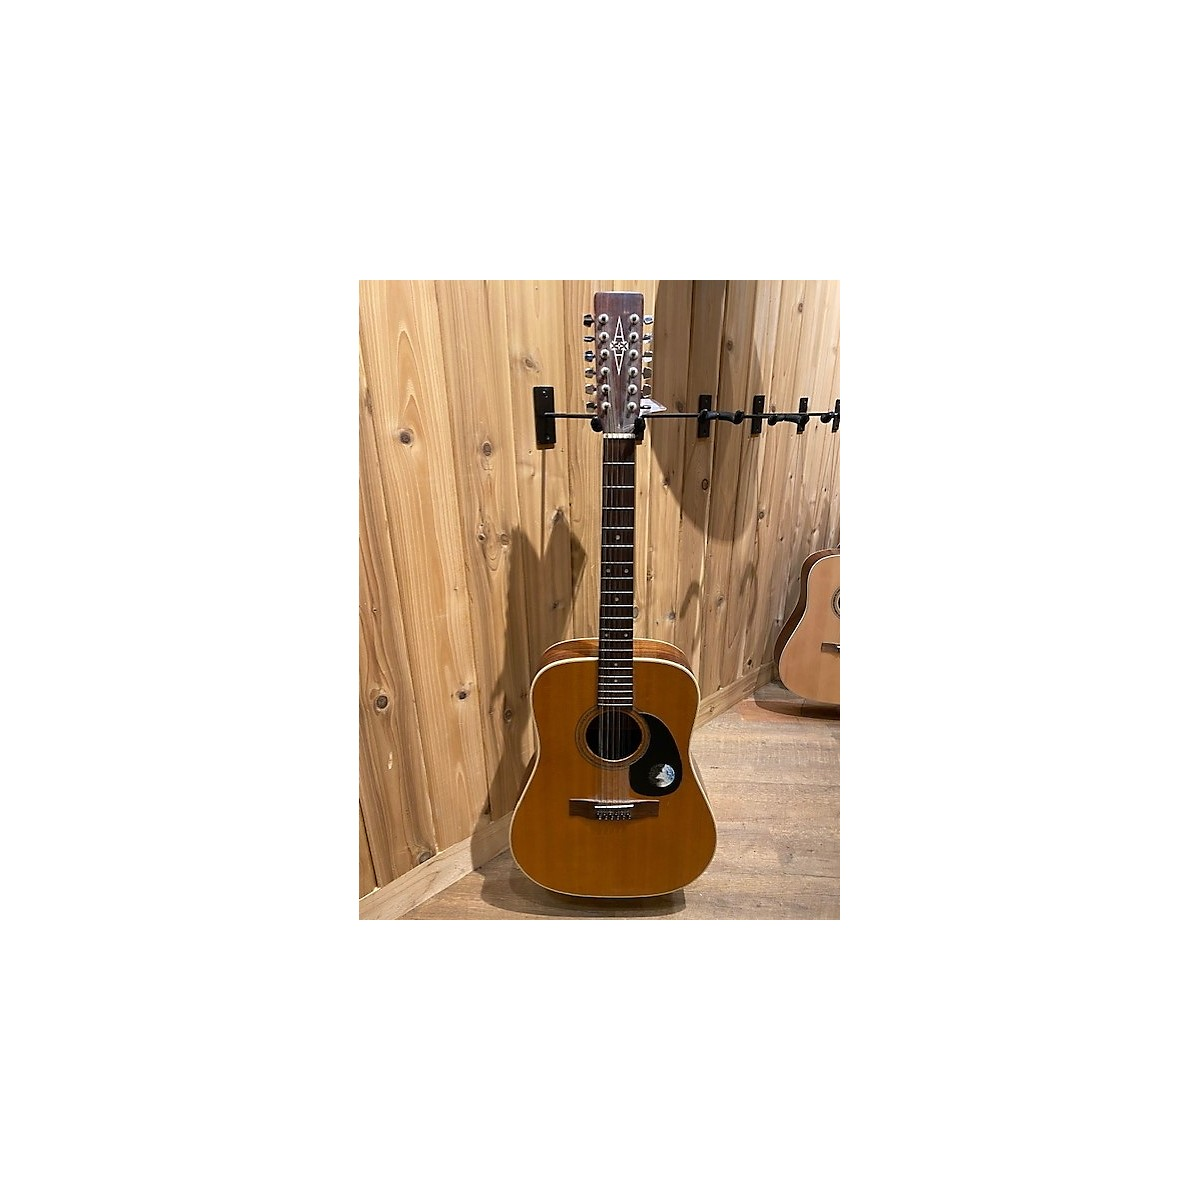 Alvarez 1980s 5054 12 String Acoustic Guitar